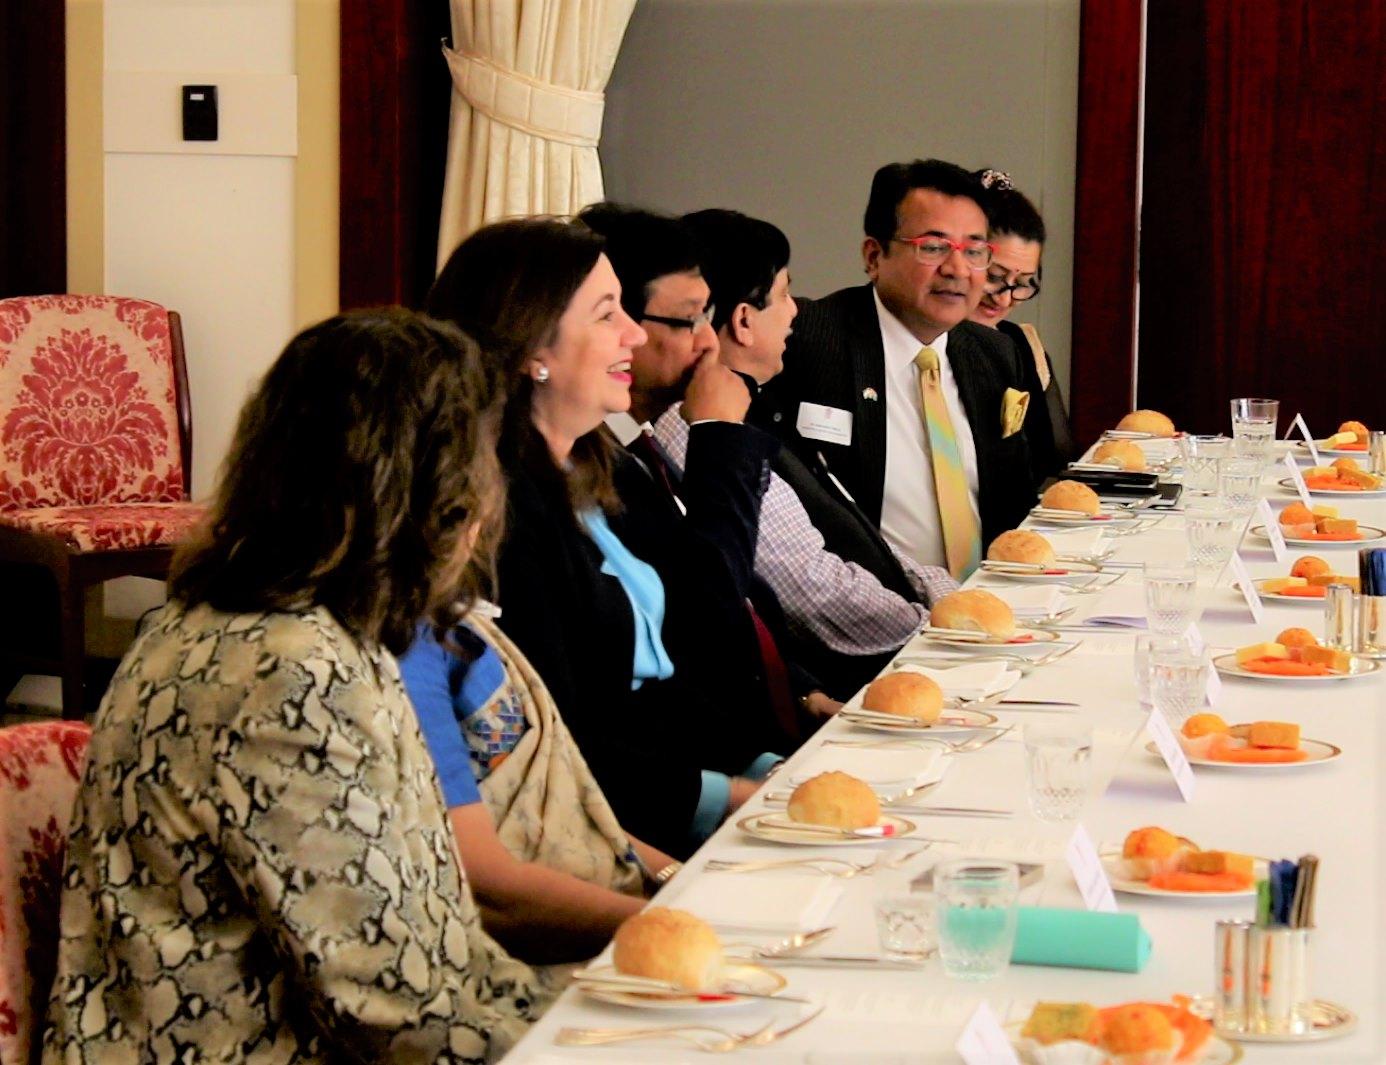 Building engagements with Queensland Premier Annastacia Palaszczuk